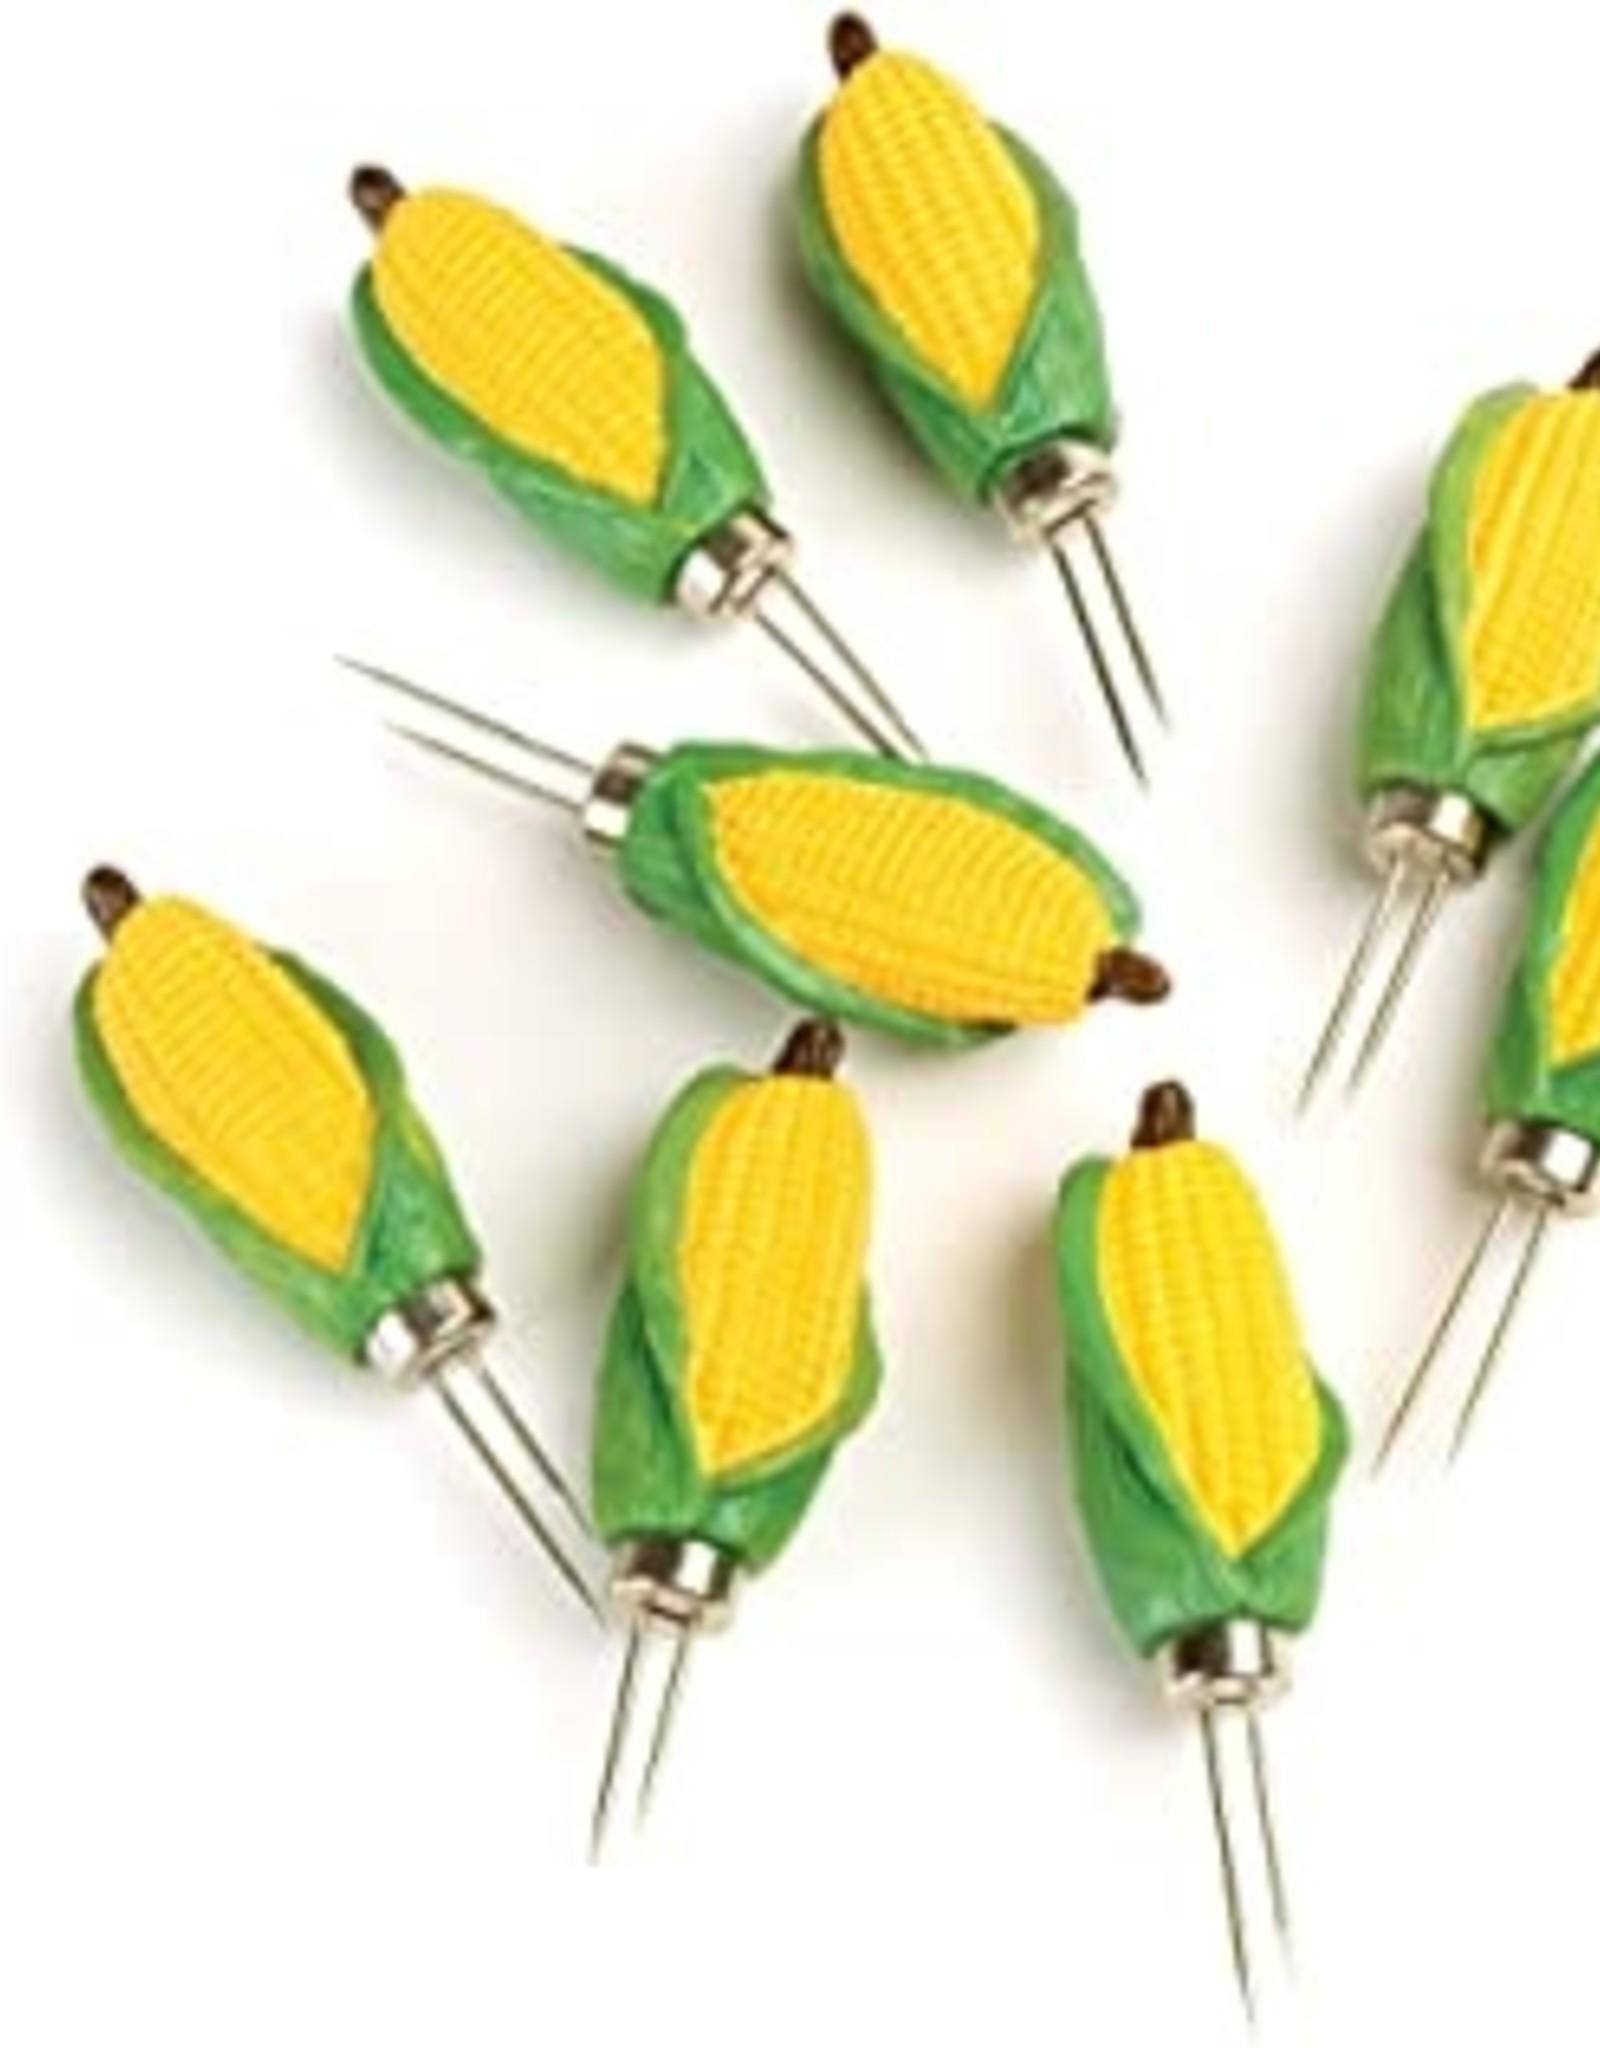 Corn Holder - Corn